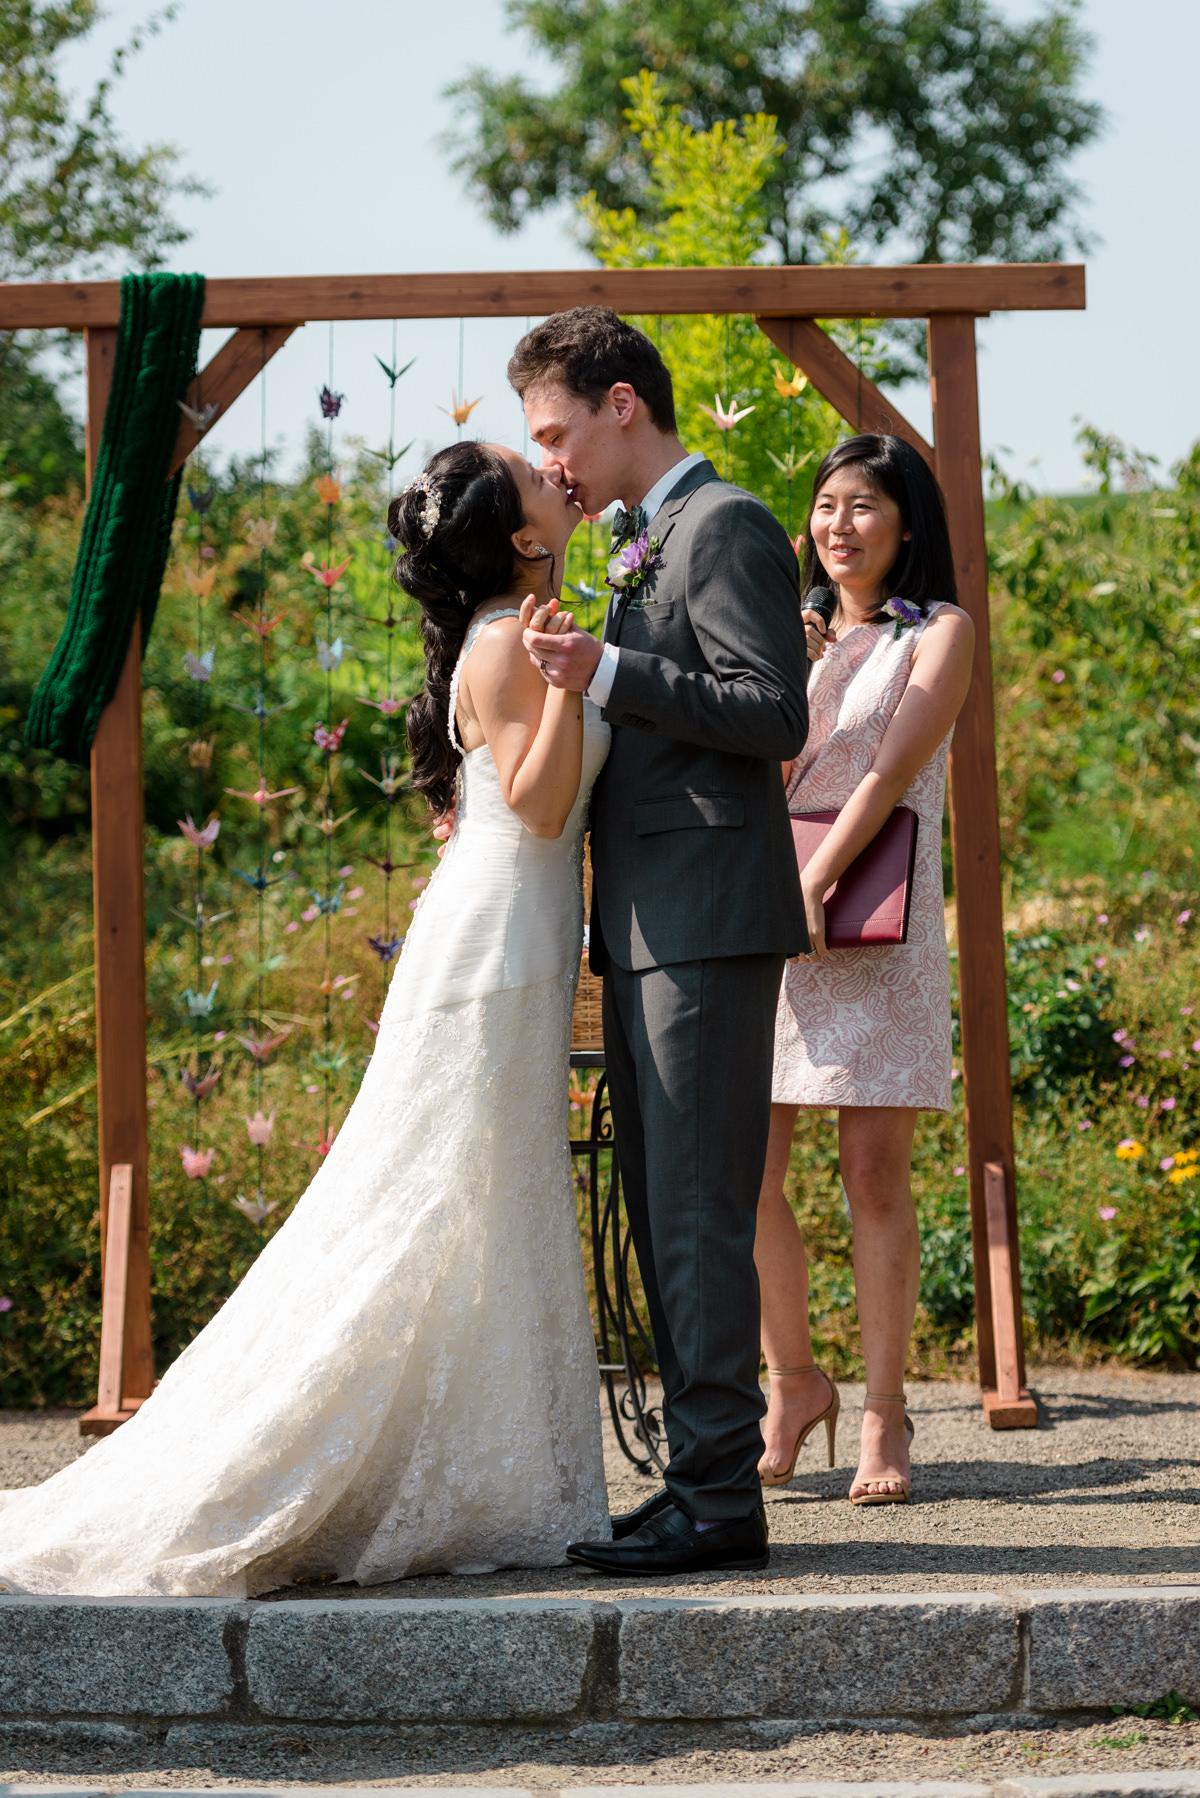 Andrew Tat - Documentary Wedding Photography - Heritage Hall - Kirkland, Washington - Grace & James - 50.JPG